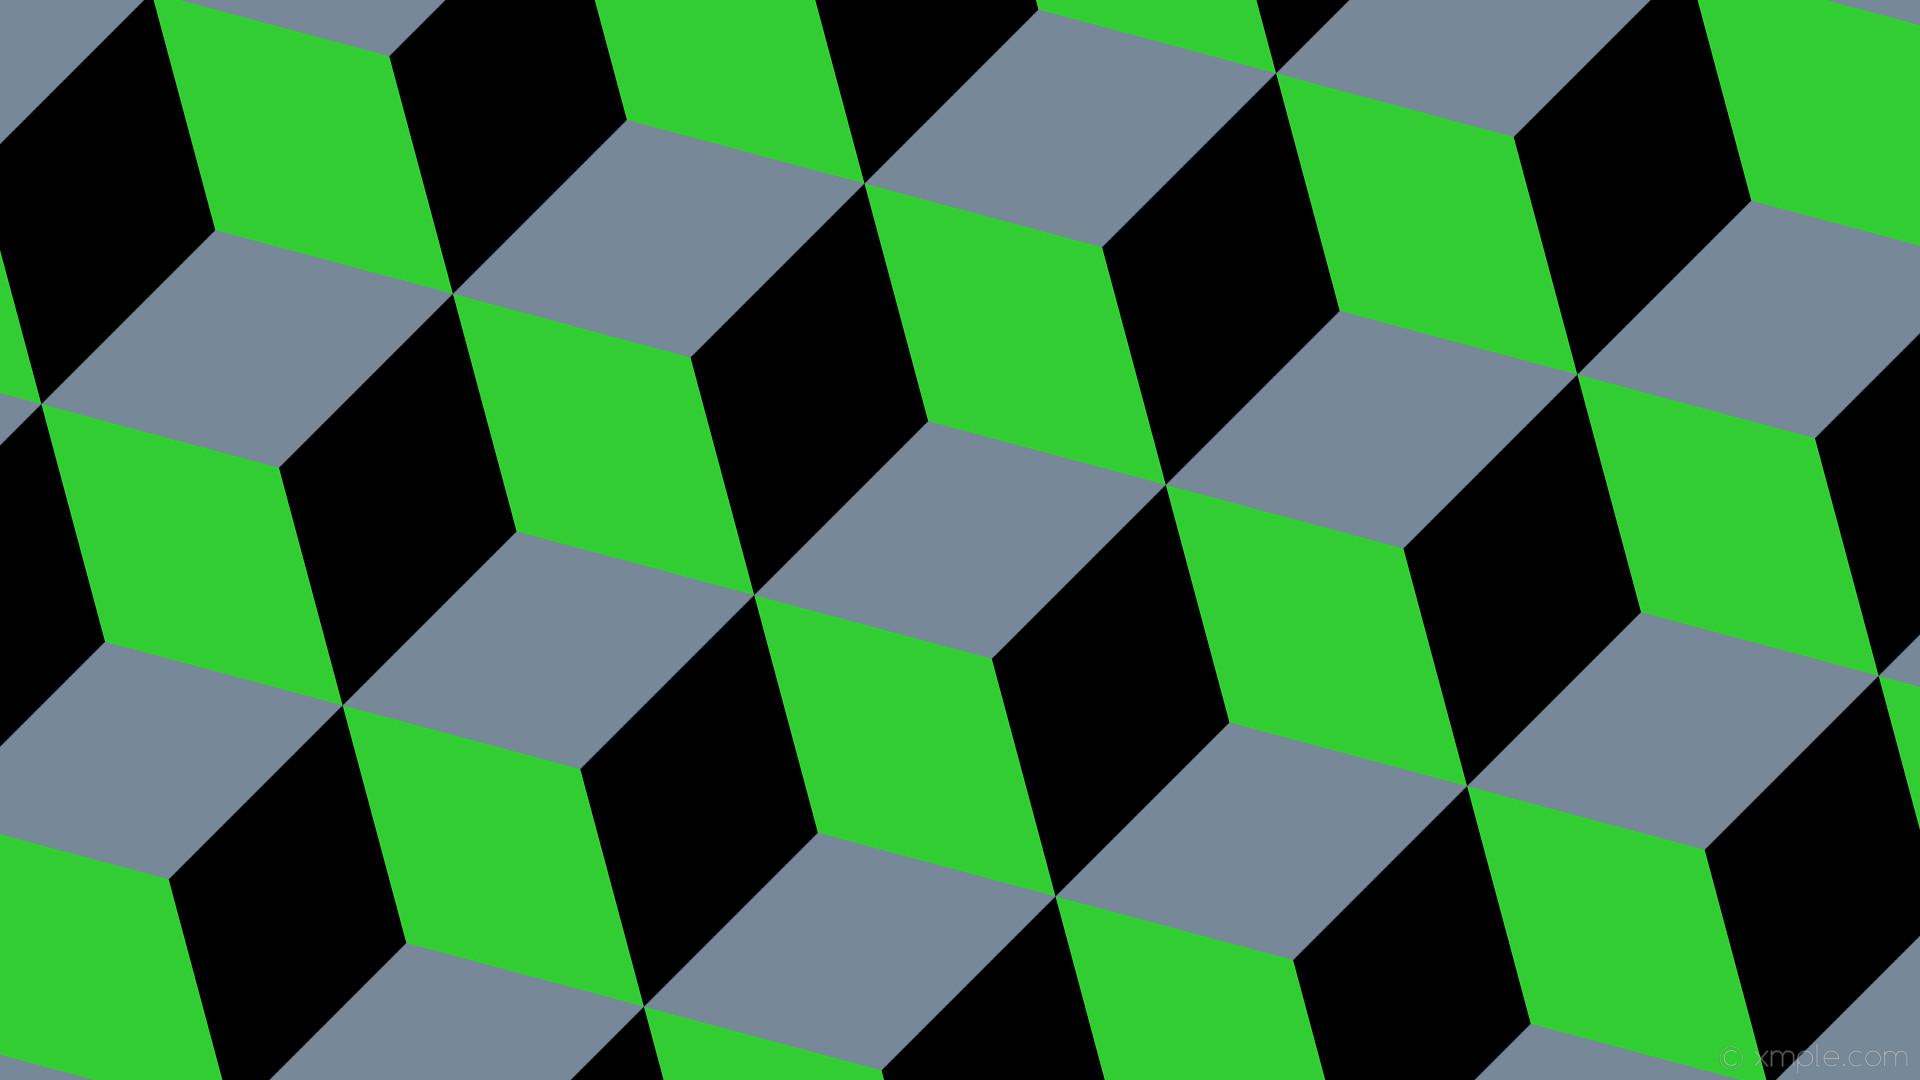 wallpaper grey black 3d cubes green light slate gray lime green #778899  #32cd32 #